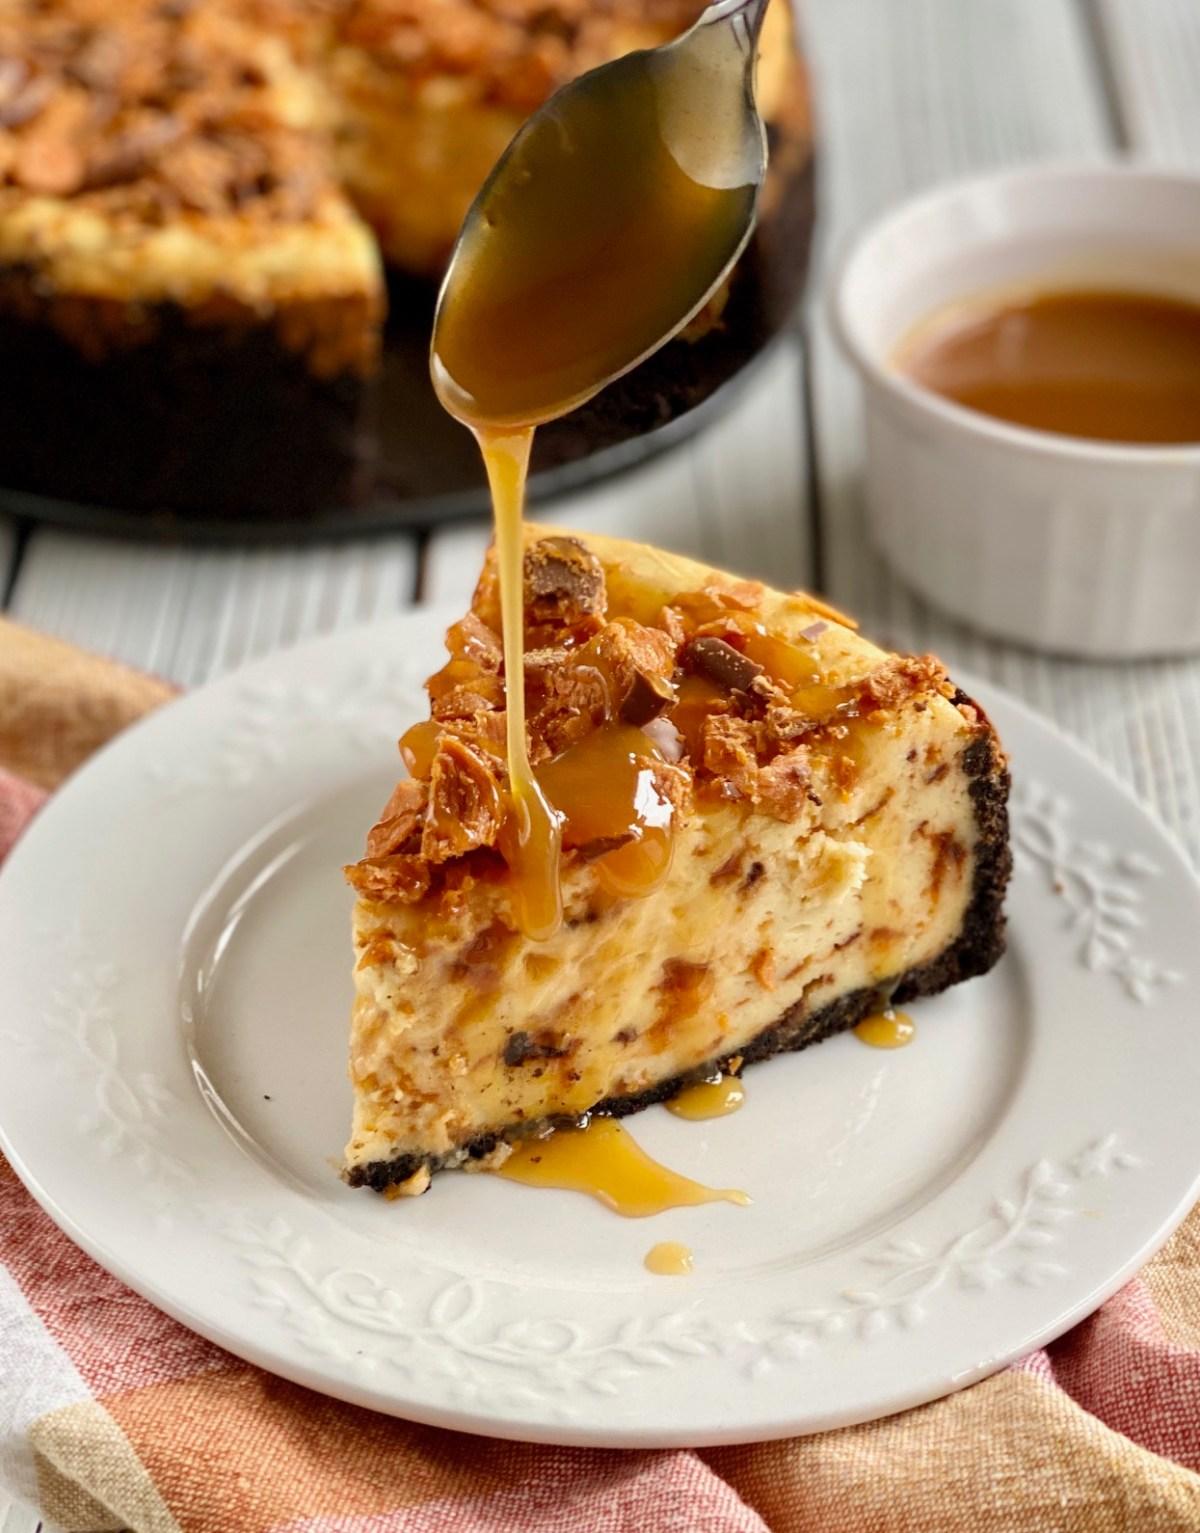 Butterfinger Cheesecake by Happylifeblogspot.com #butterfingercheesecake #butterfingerrecipes #cheesecake #cheesecakerecipes #springformpanrecipes #dessert #holidaydessert #thanksgivingdessert #christmasdessert #halloweencandyrecipes